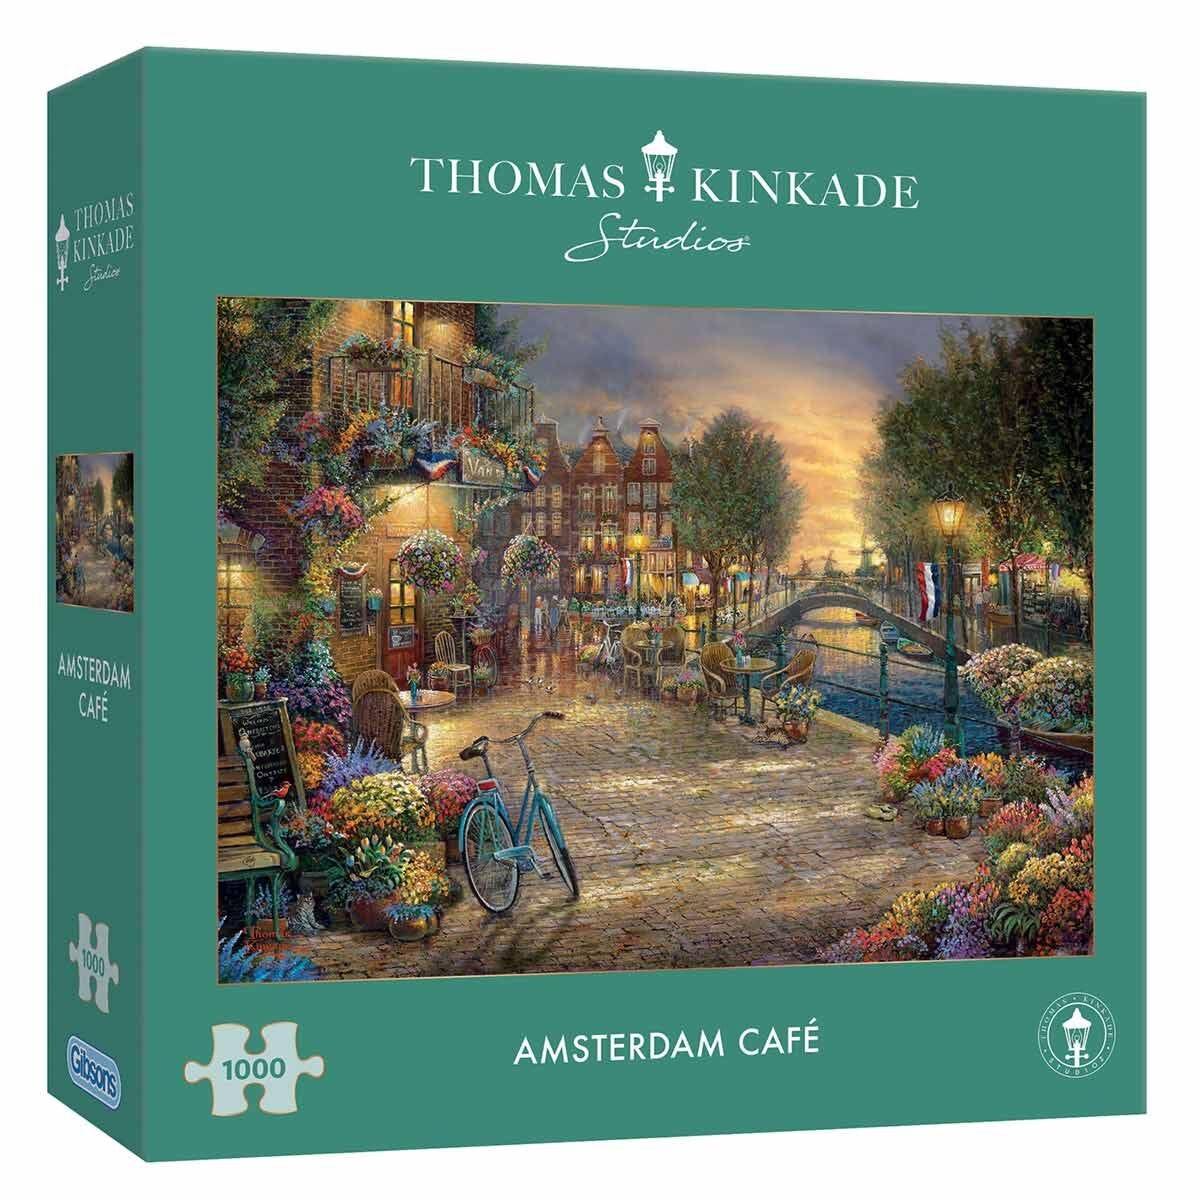 Gibsons Kinkade Edition Amsterdam Cafe 1000 Piece Jigsaw Puzzle